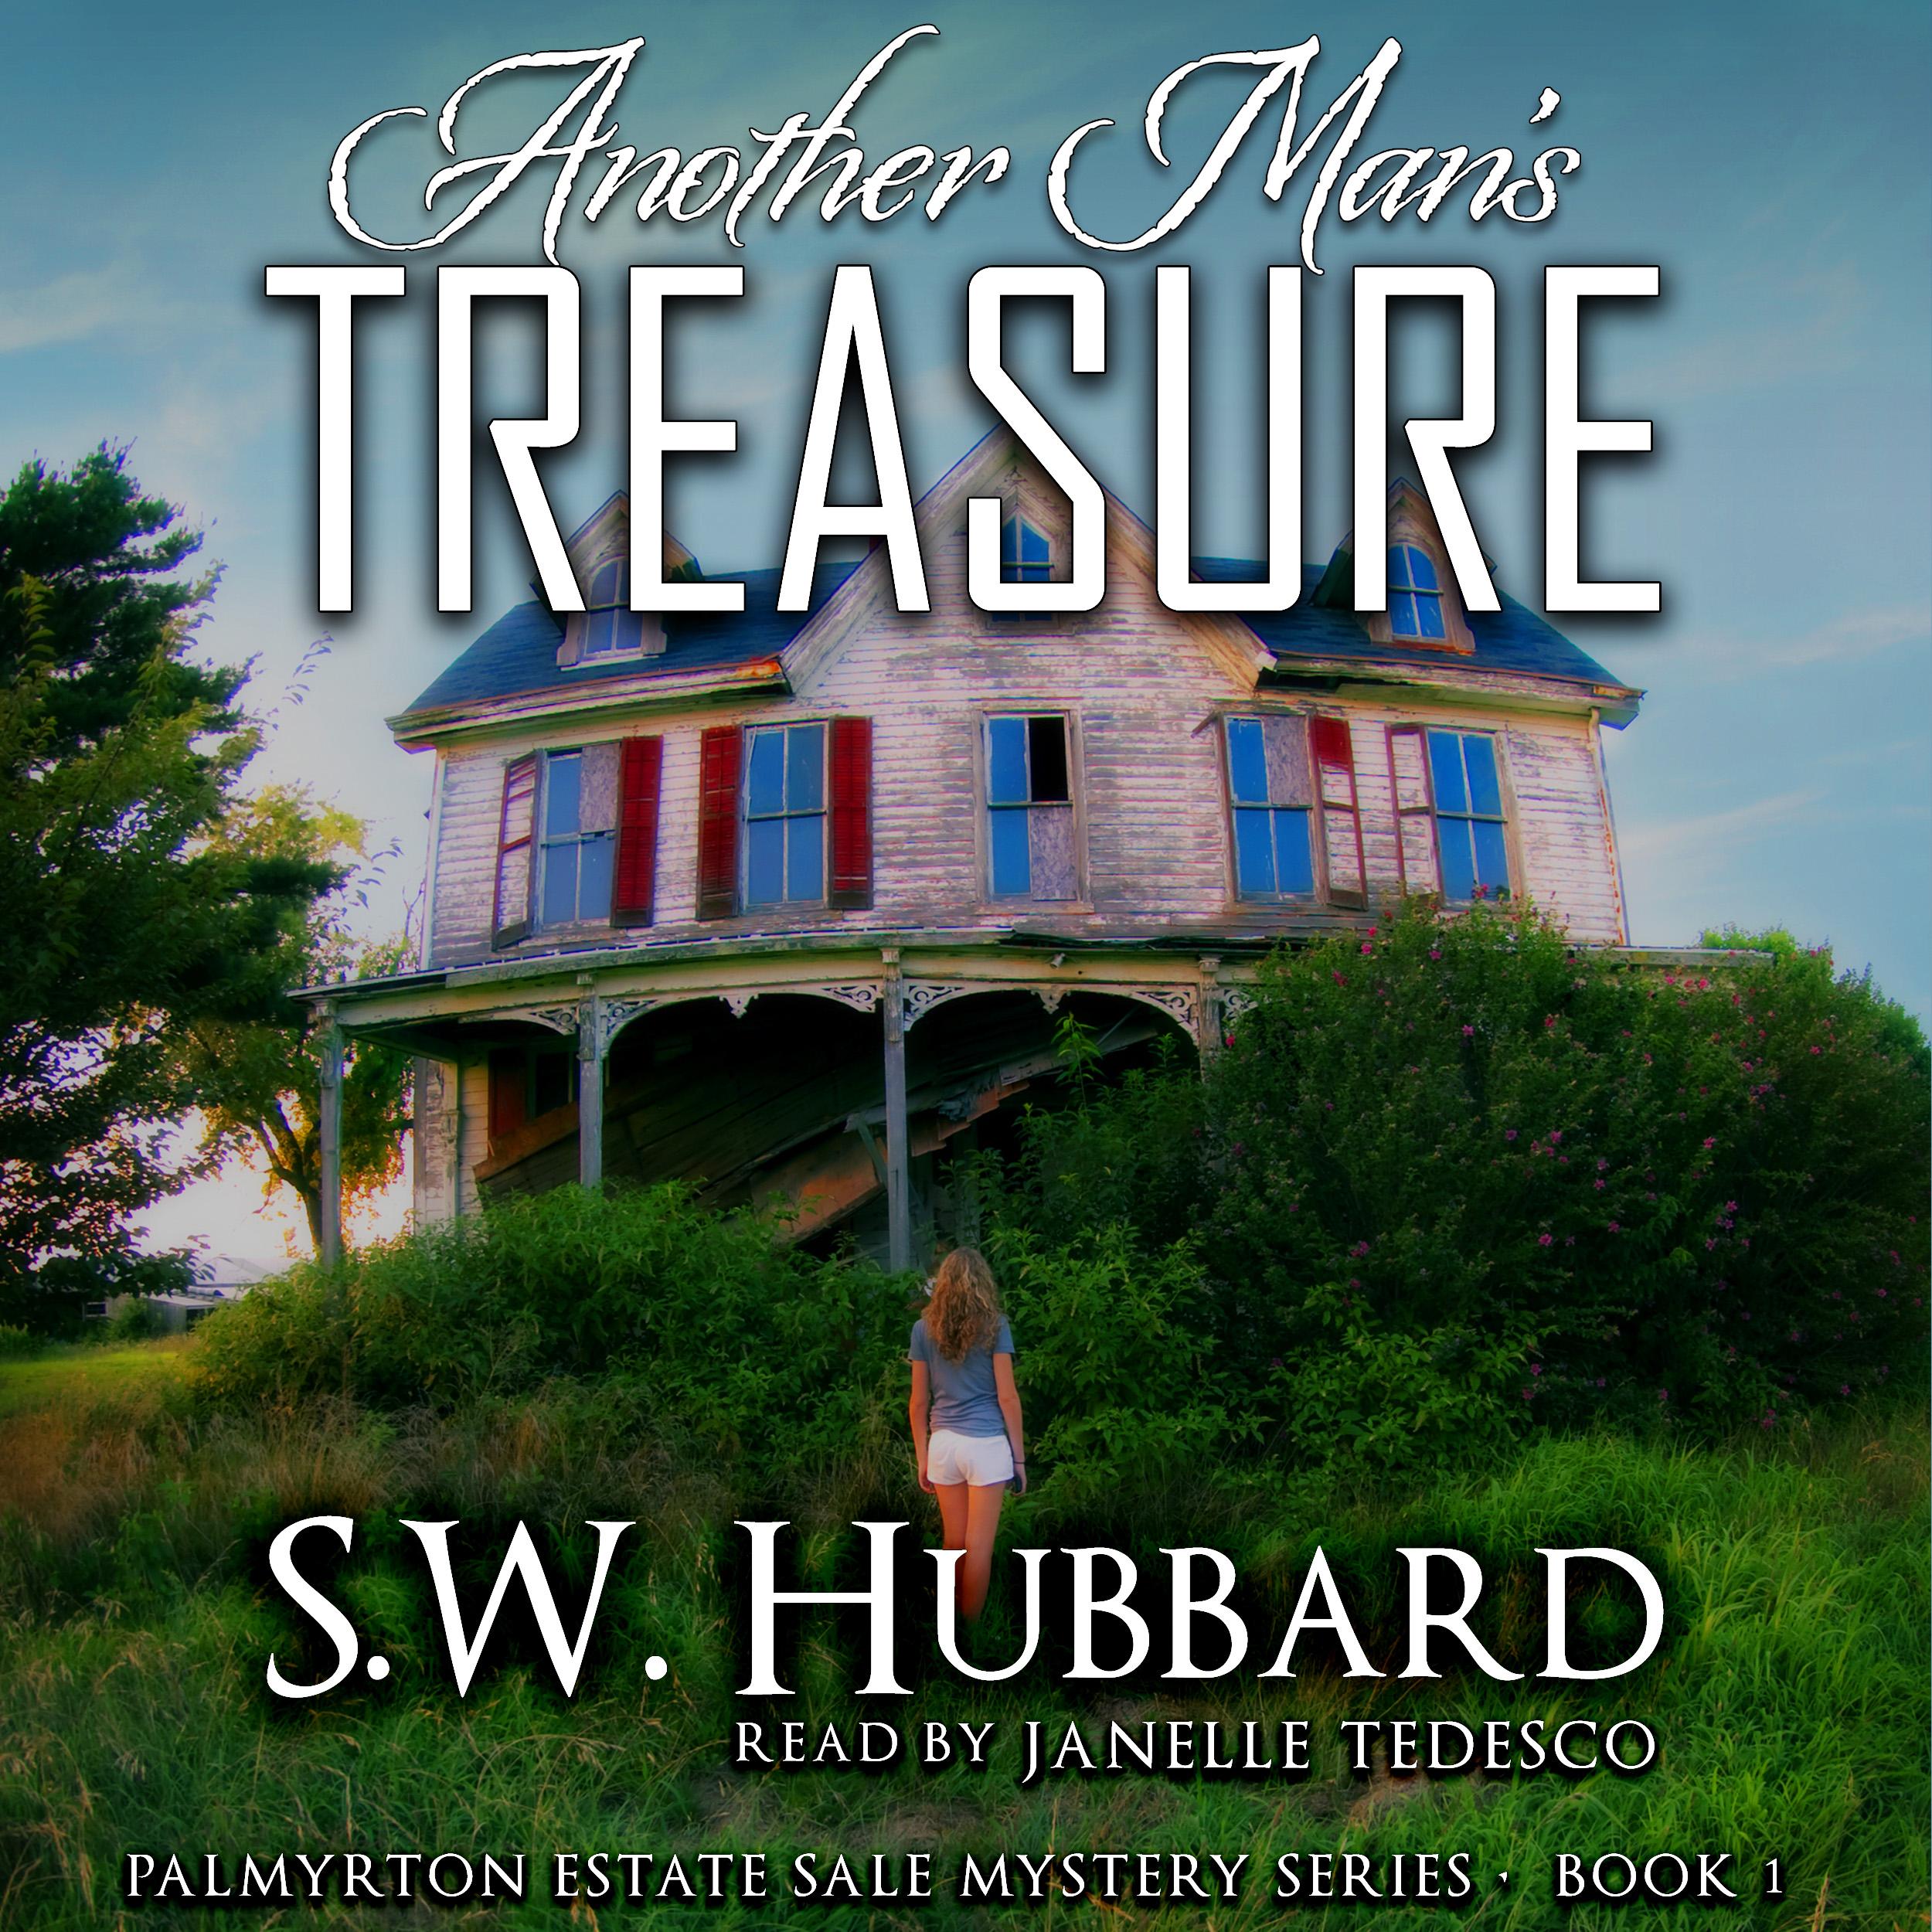 swhubbard_anothermanstreasure_audio